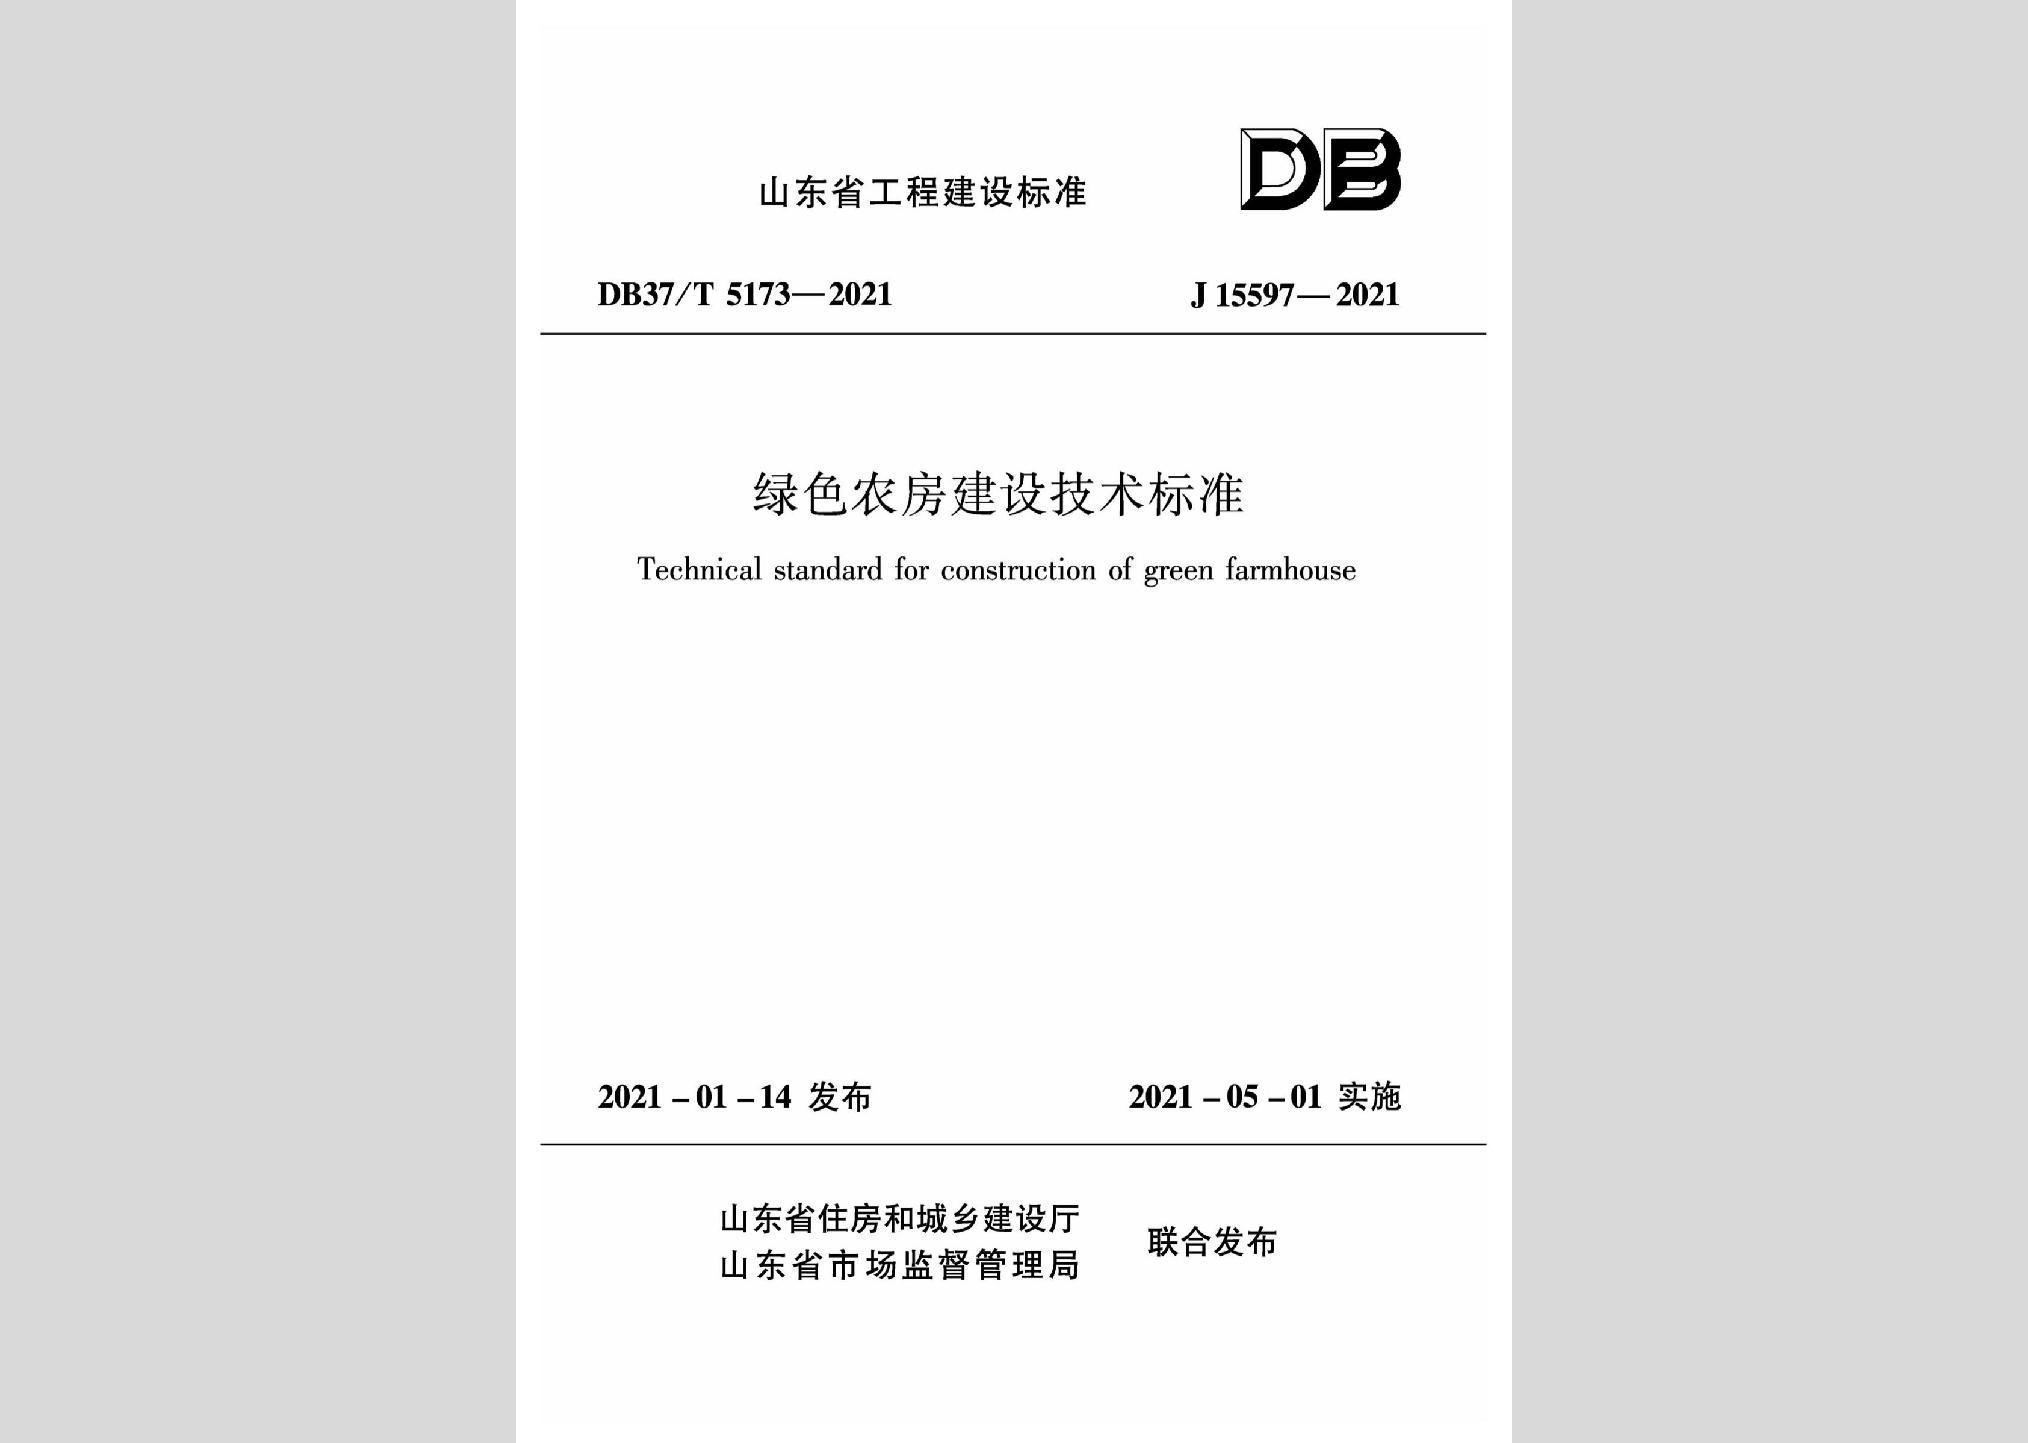 DB37/T5173-2021:绿色农房建设技术标准